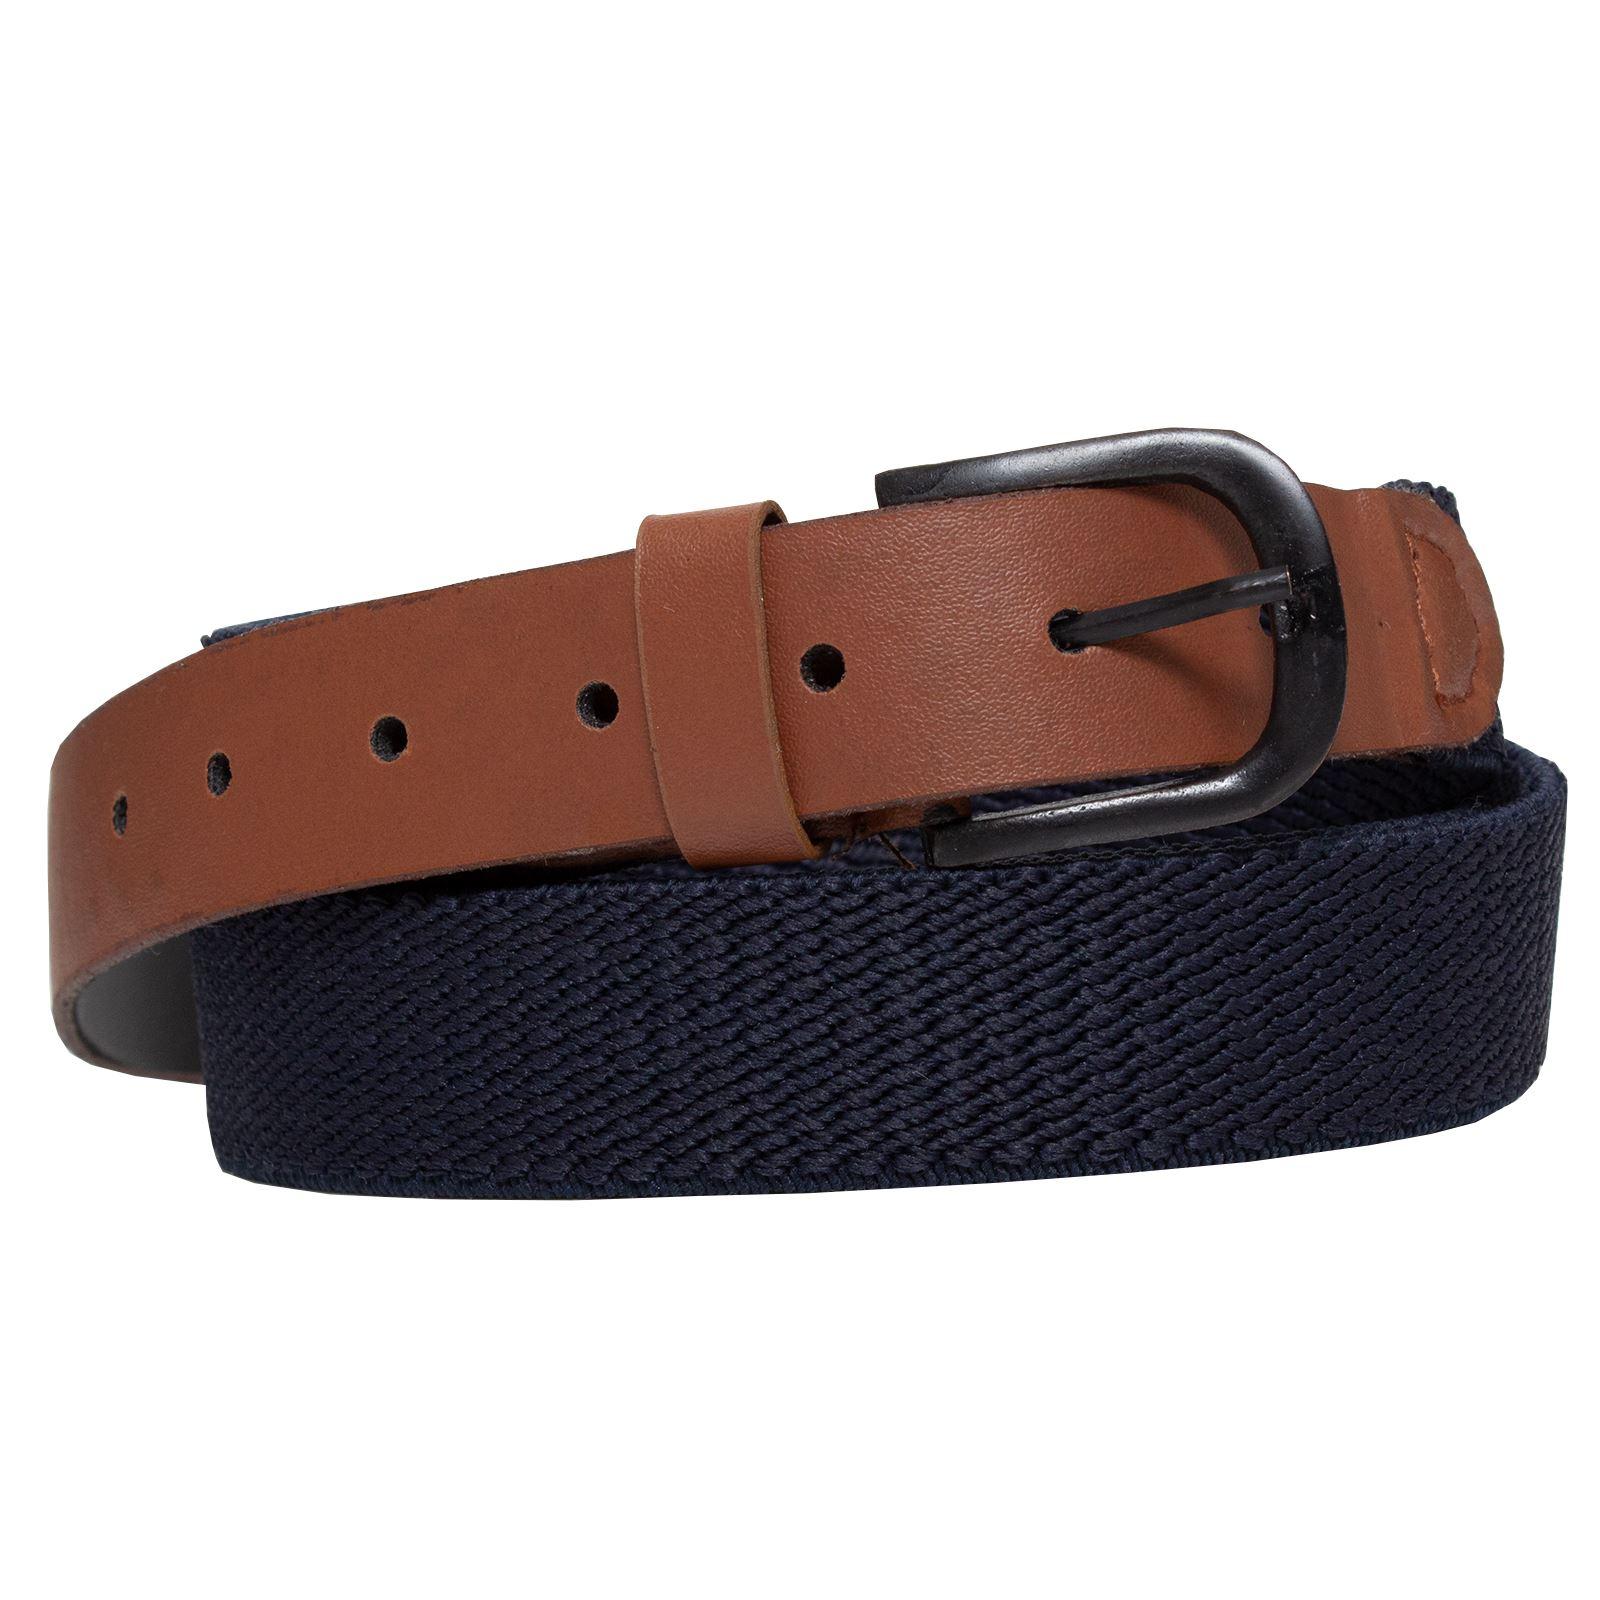 Mens Ladies Elasticated Webbing Belts PU Leather Trim Stretch Canvas Buckle Belt